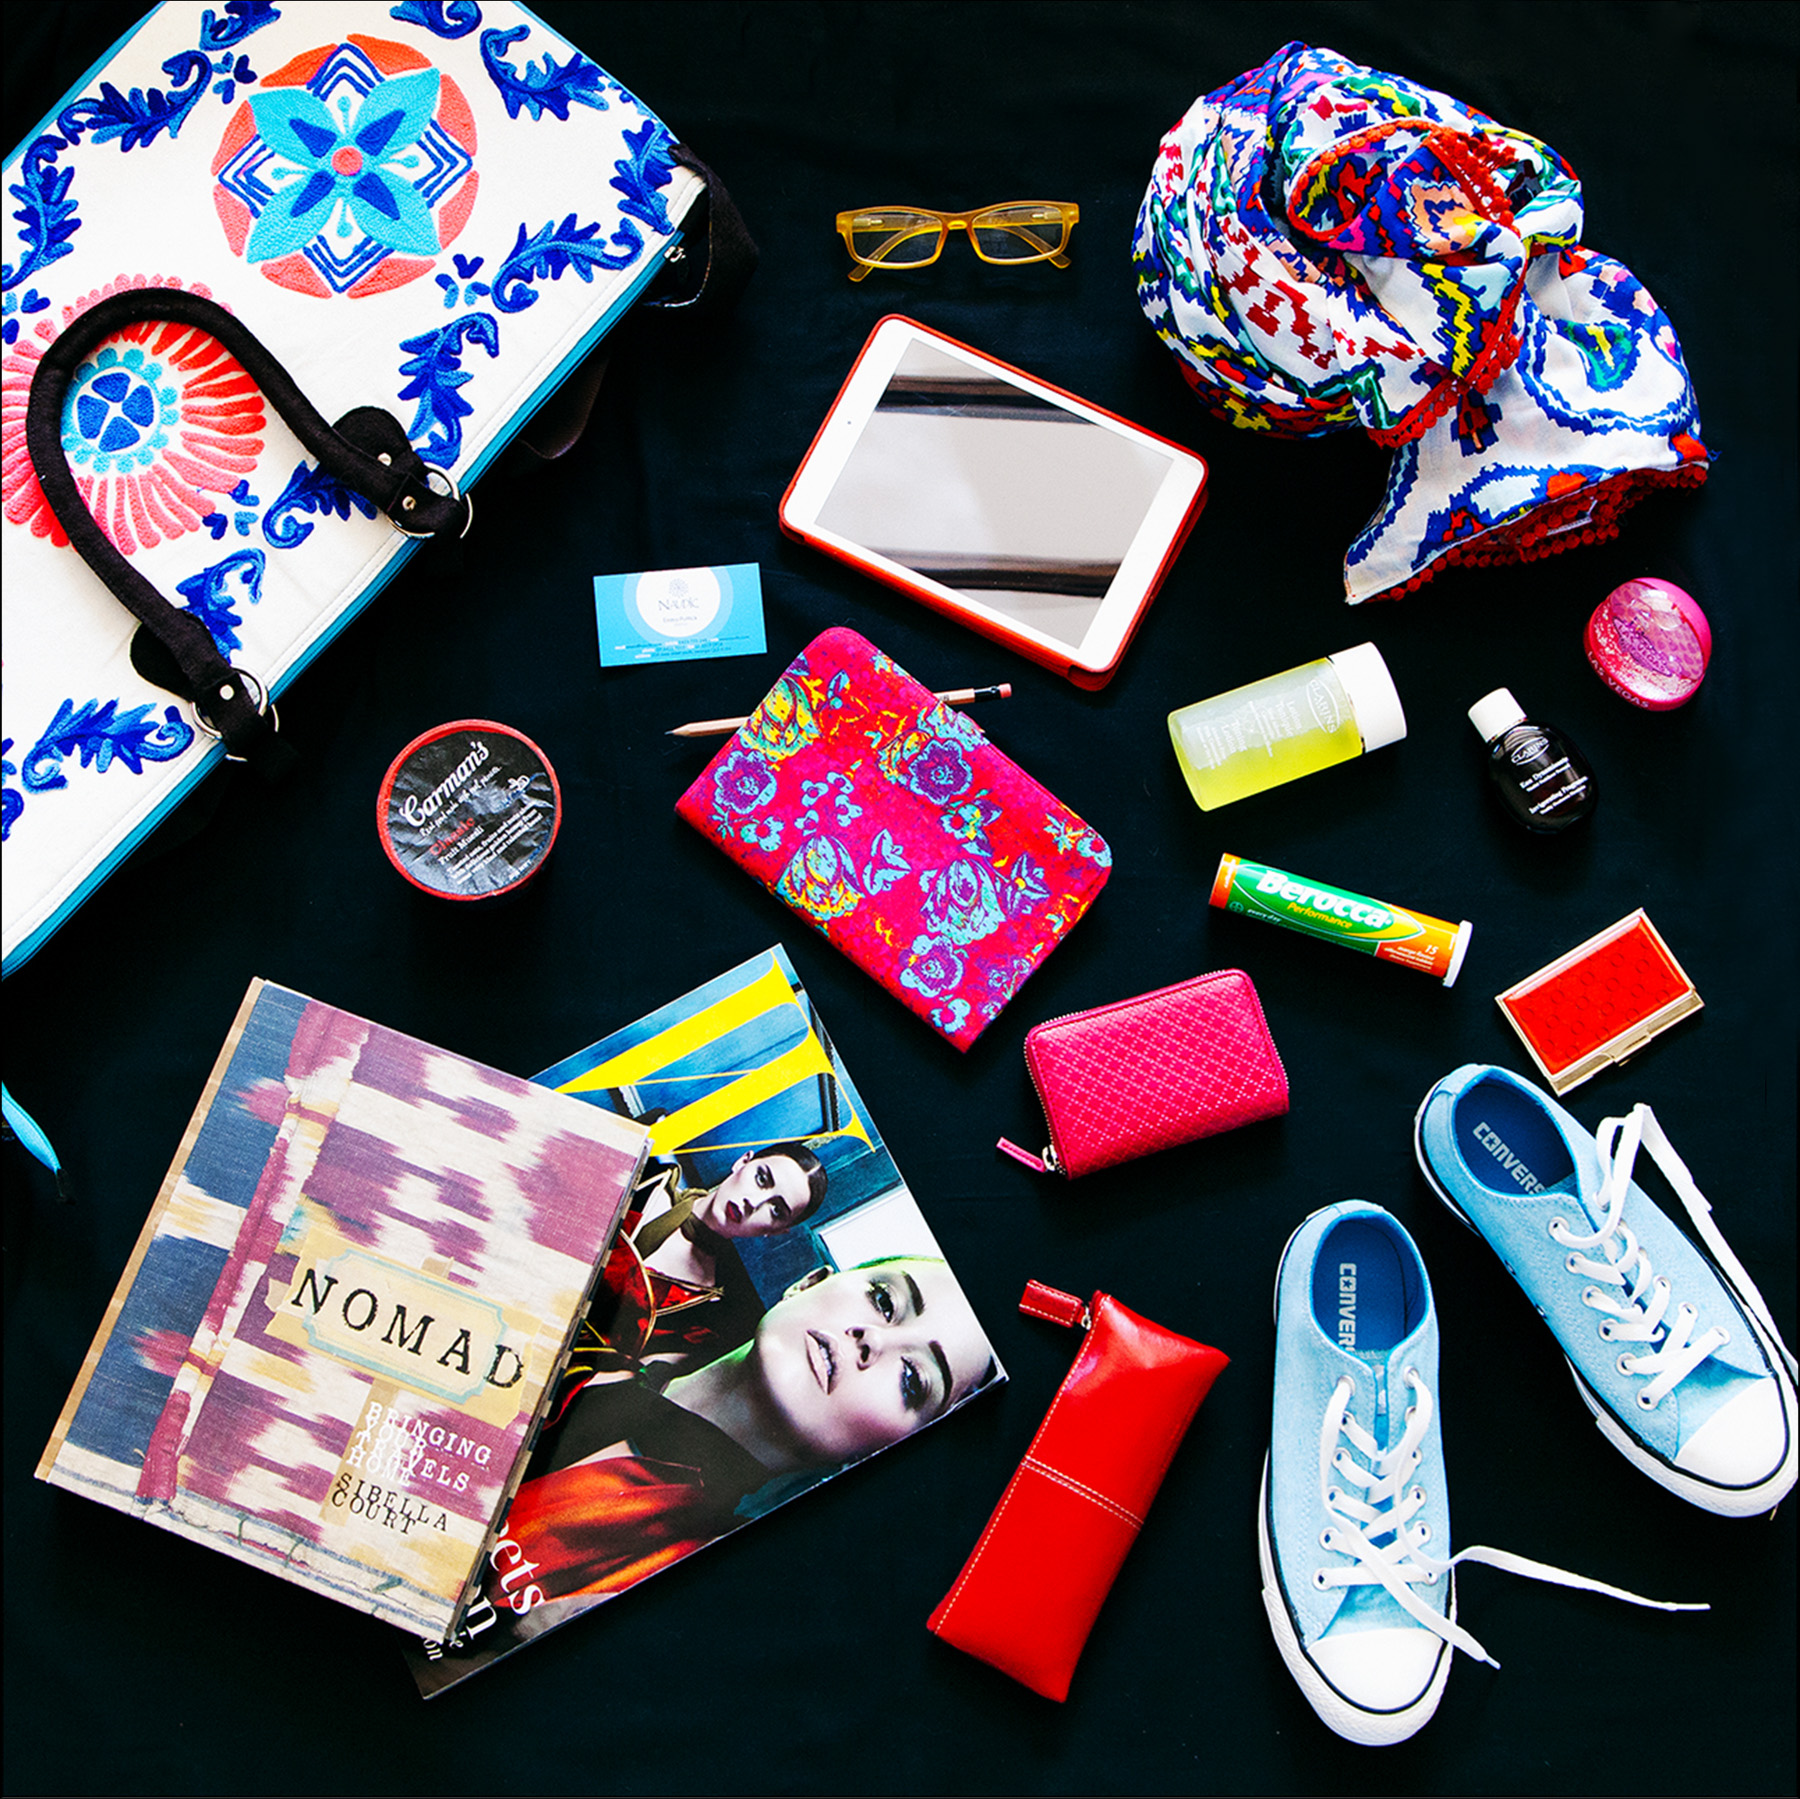 Our travel essentials